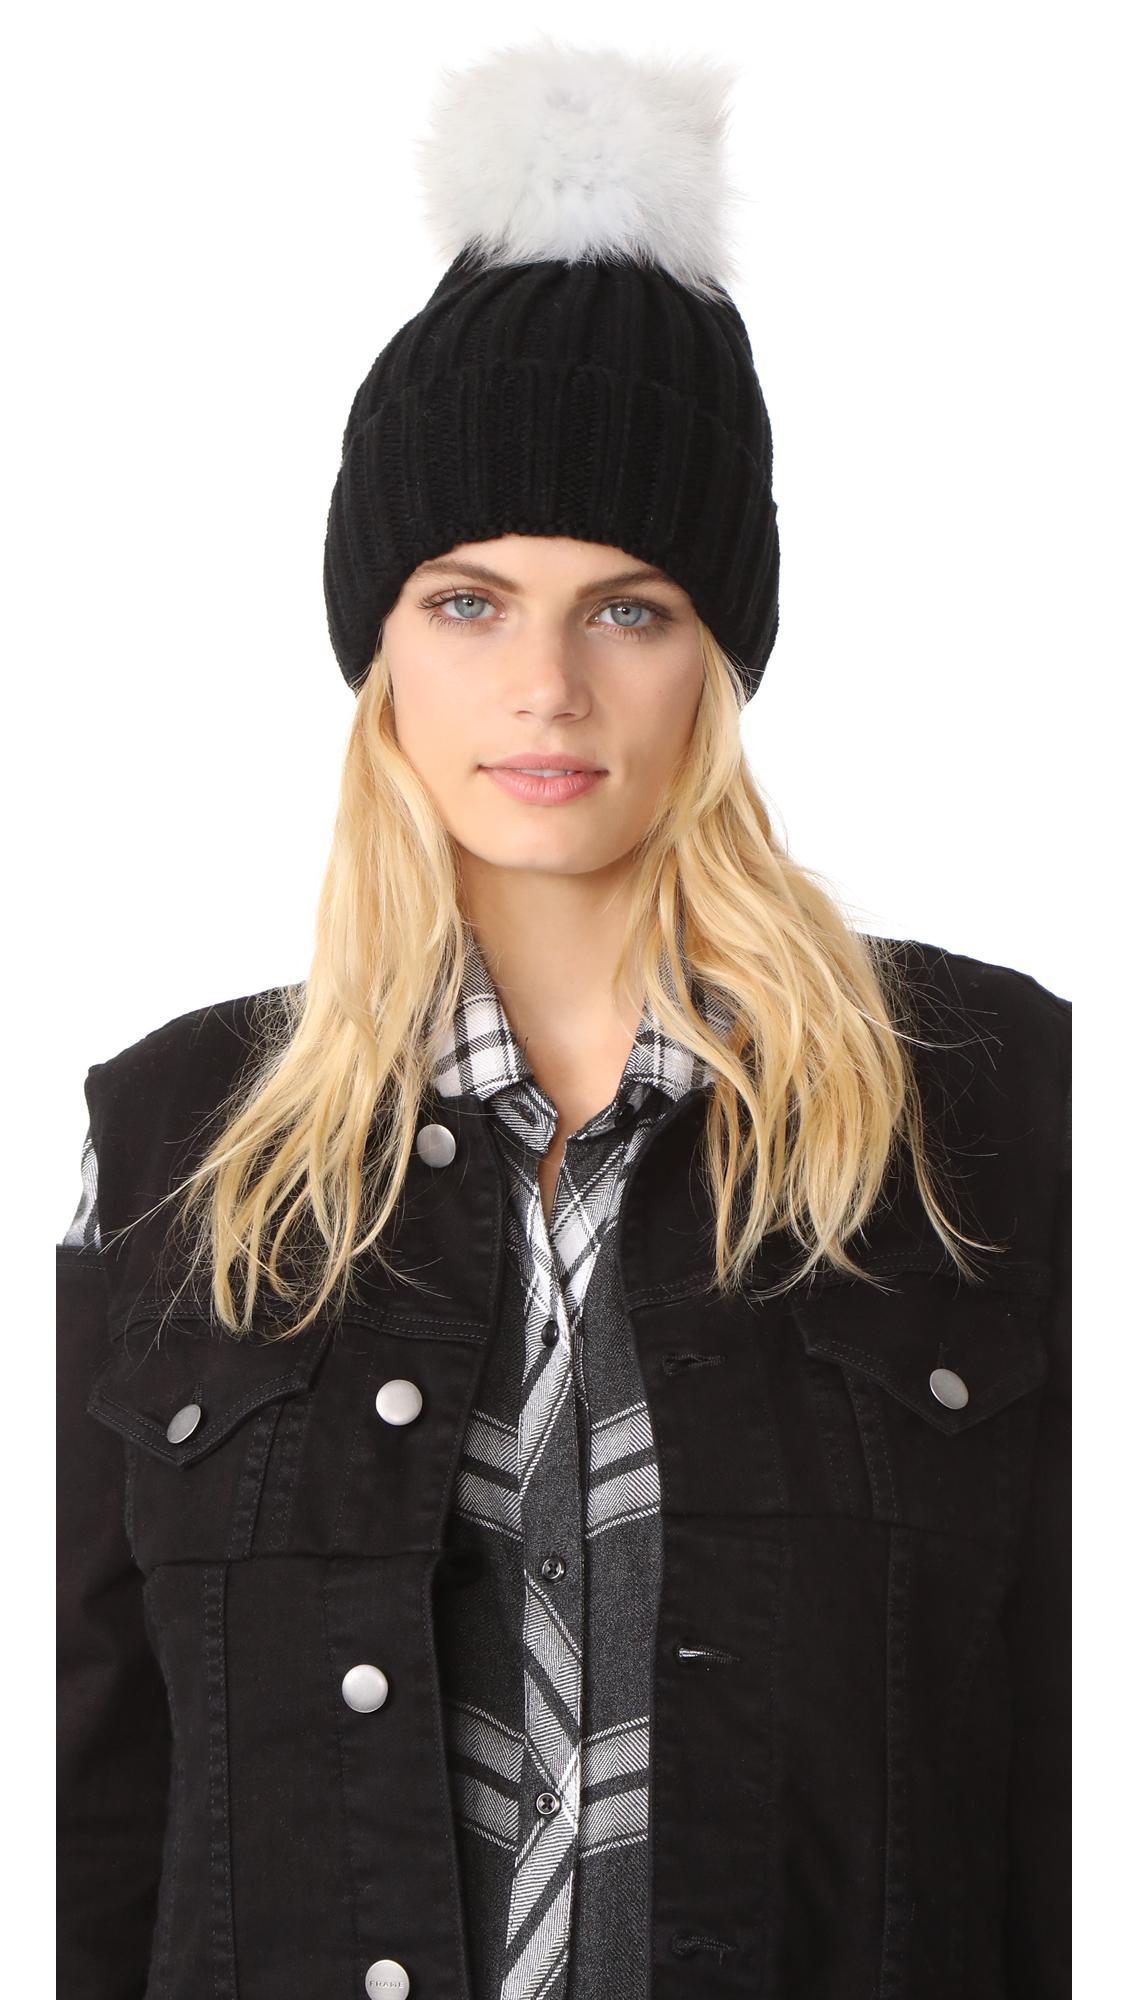 Jocelyn Knit Beanie Pom Hat - Black/White